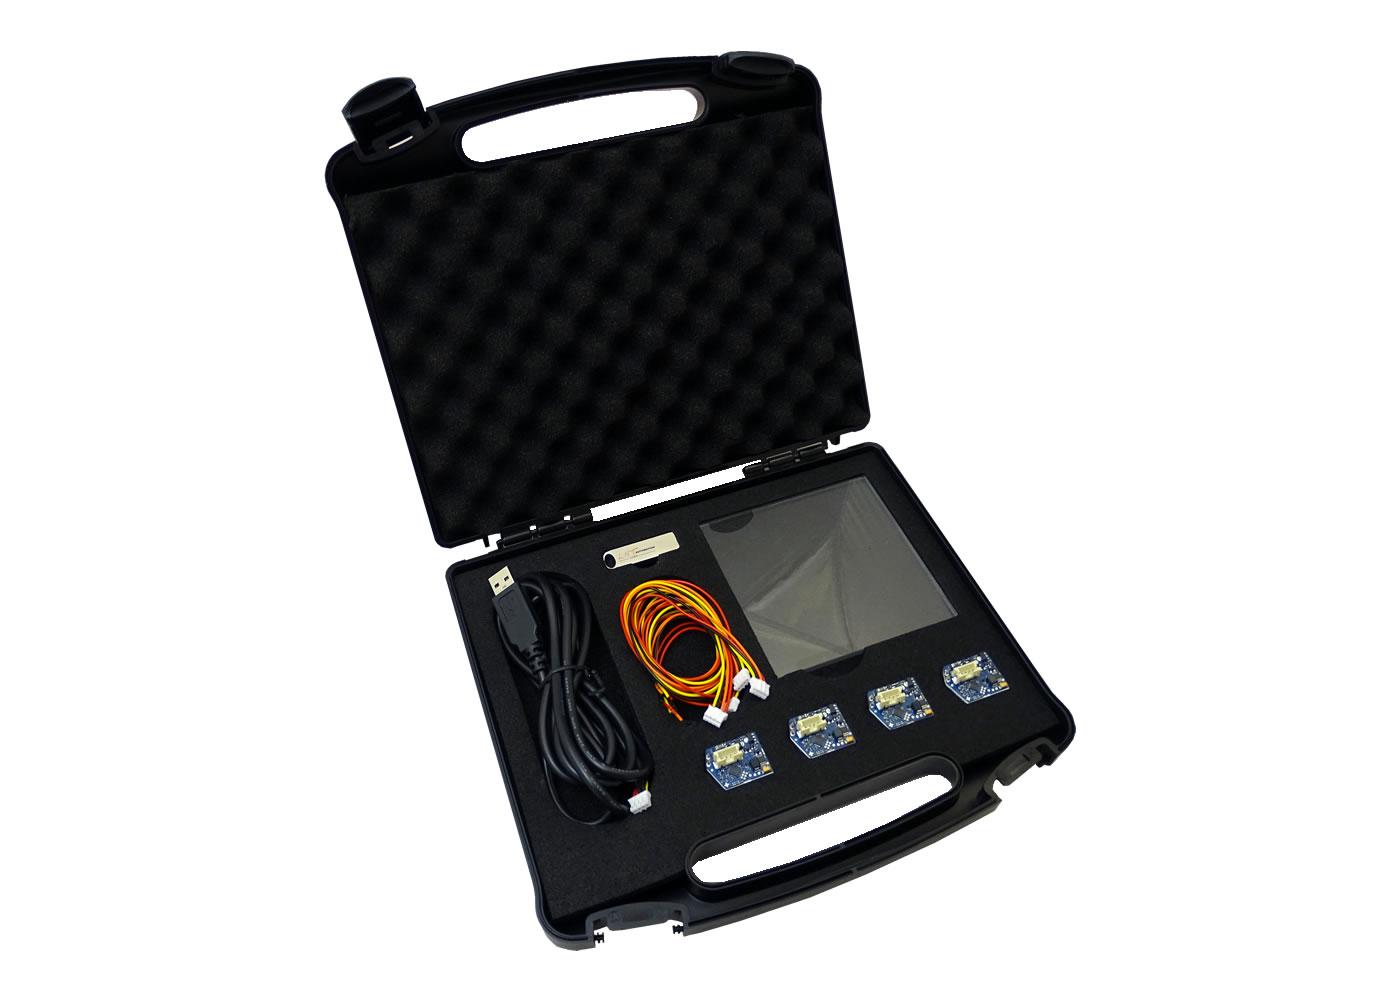 Kit d'évaluation touches capacitives ITO-Keys – Contenu